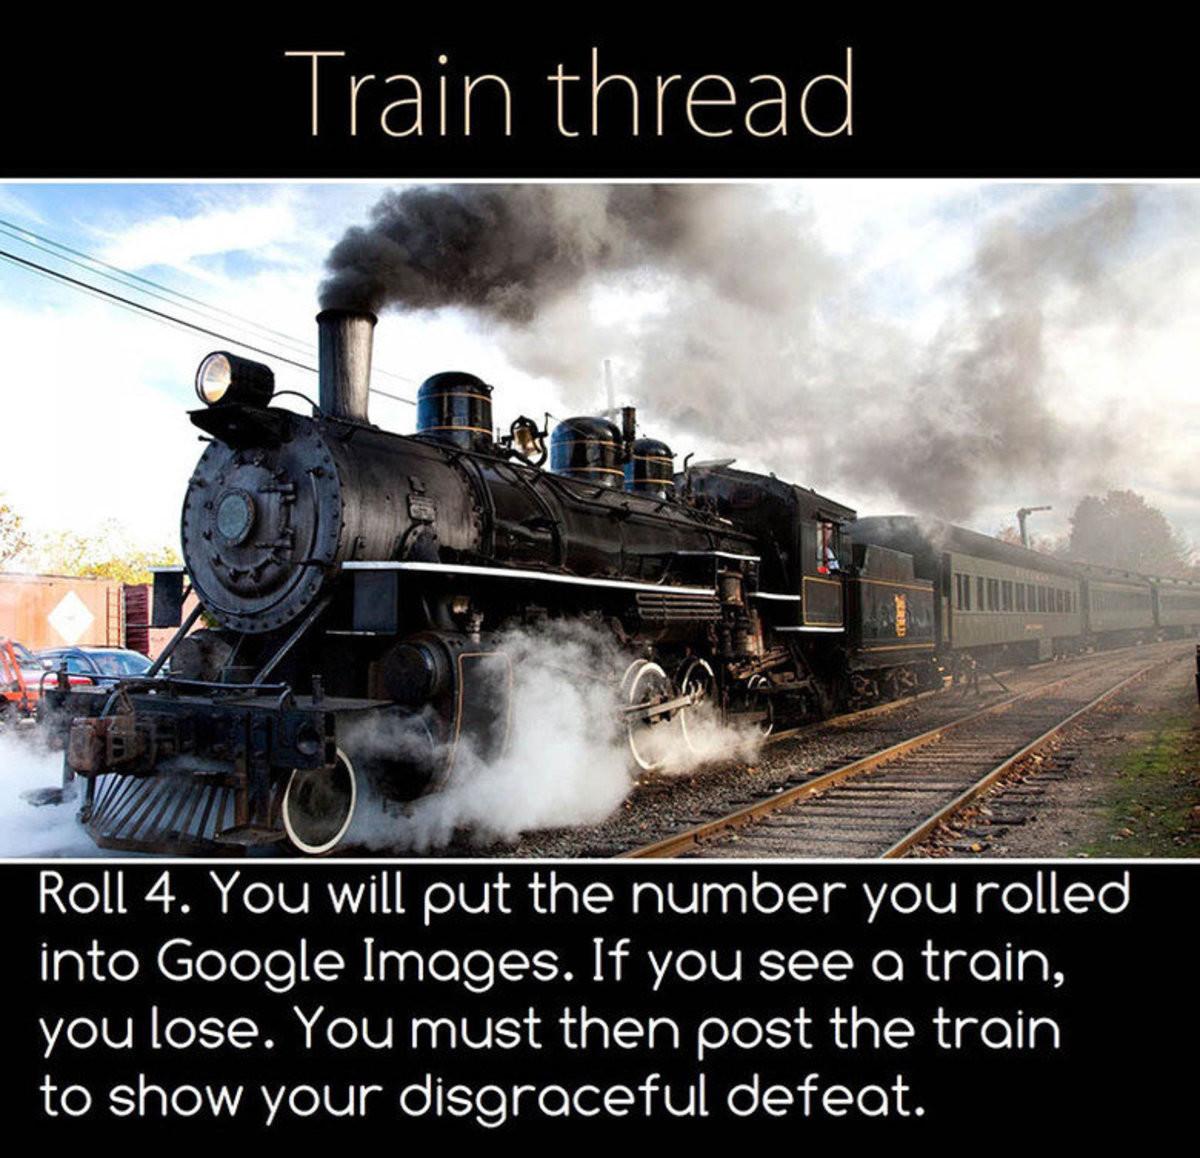 Train+game+rollbutton+large+000000+fffff